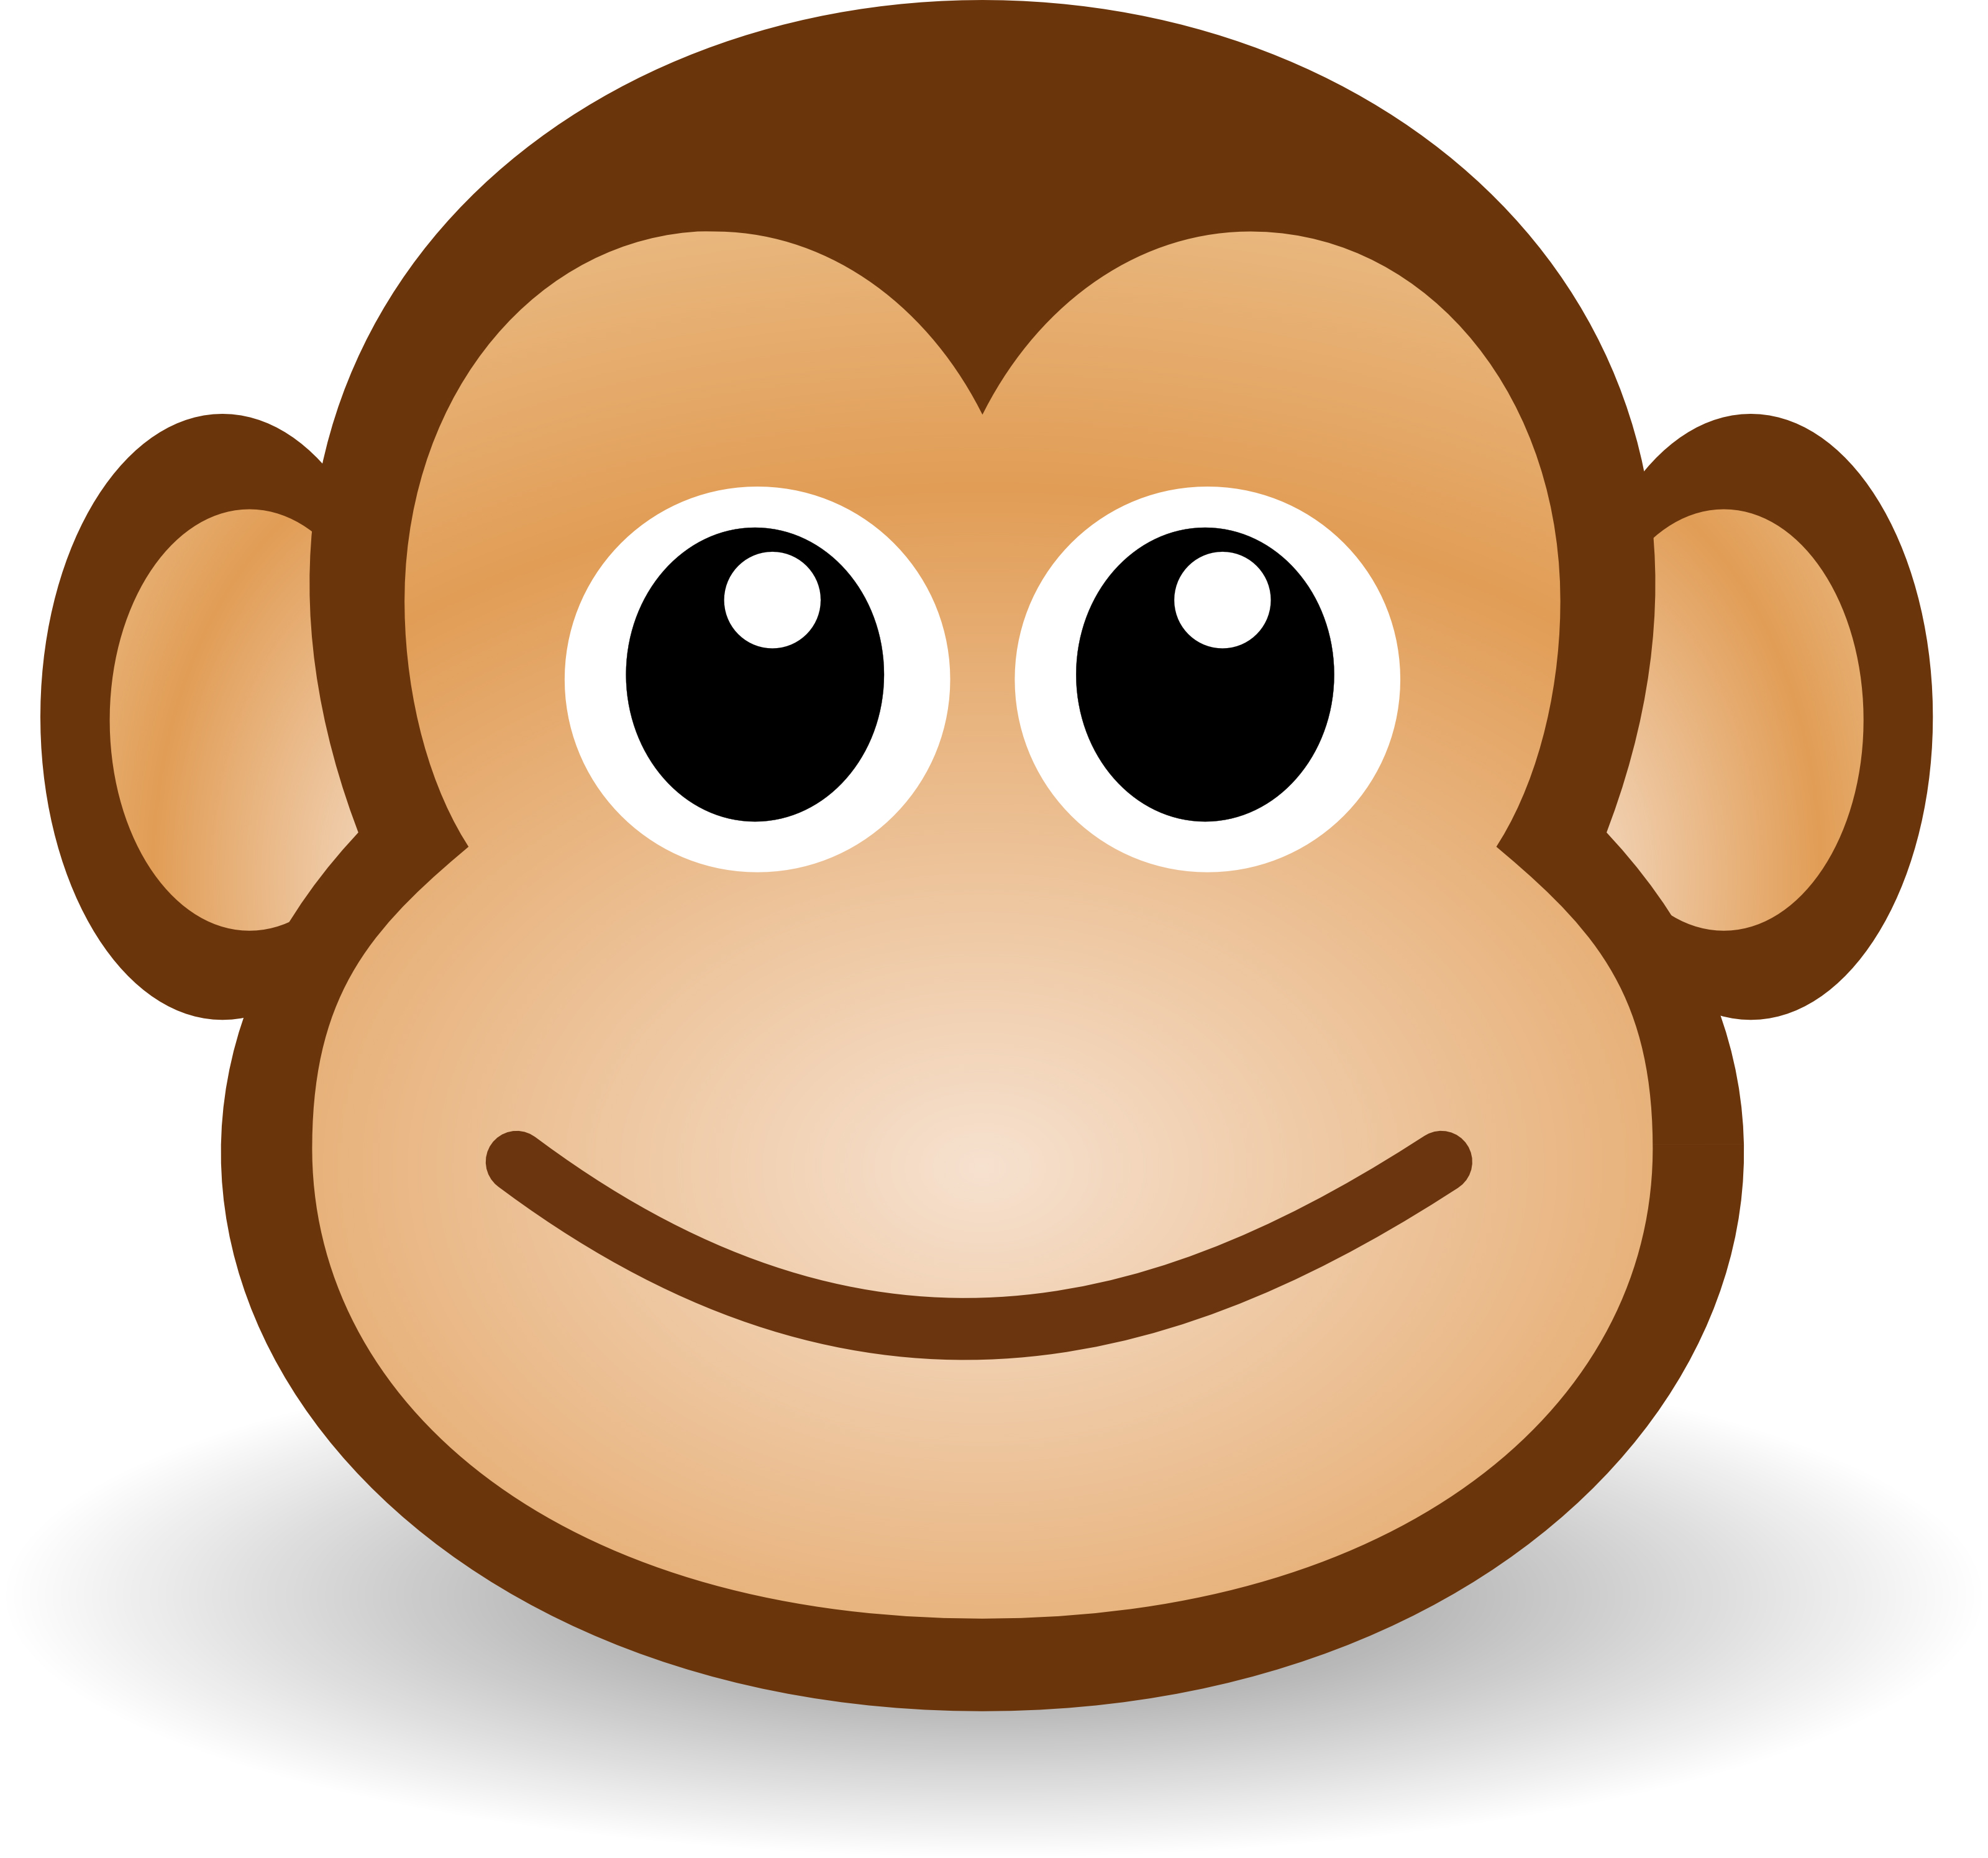 .jpg, .png, .svg,. Free Cute Cartoon Mon-.jpg, .png, .svg,. Free Cute Cartoon Monkey Clipart Illustration-16